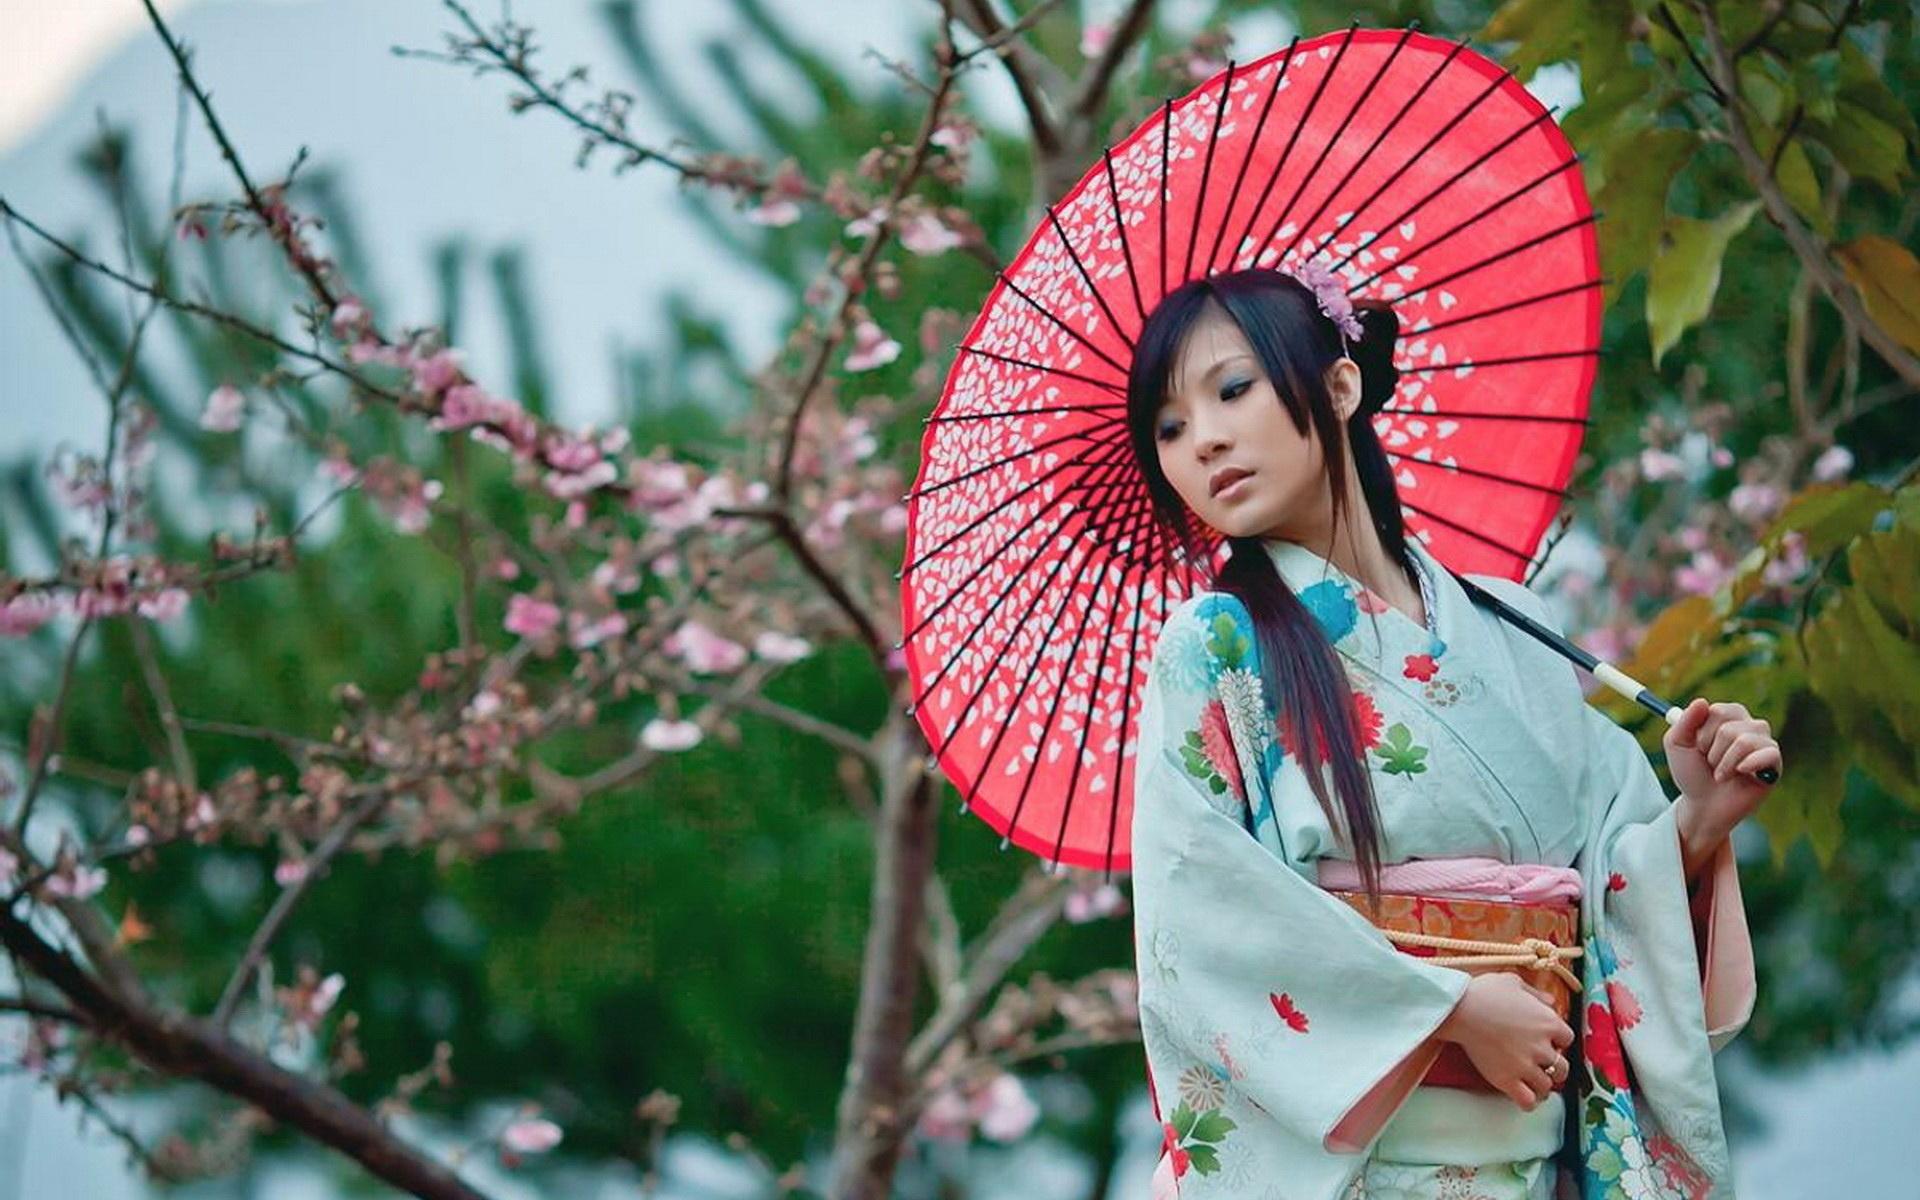 Image Result For Wallpaper Anime Girl Kimono